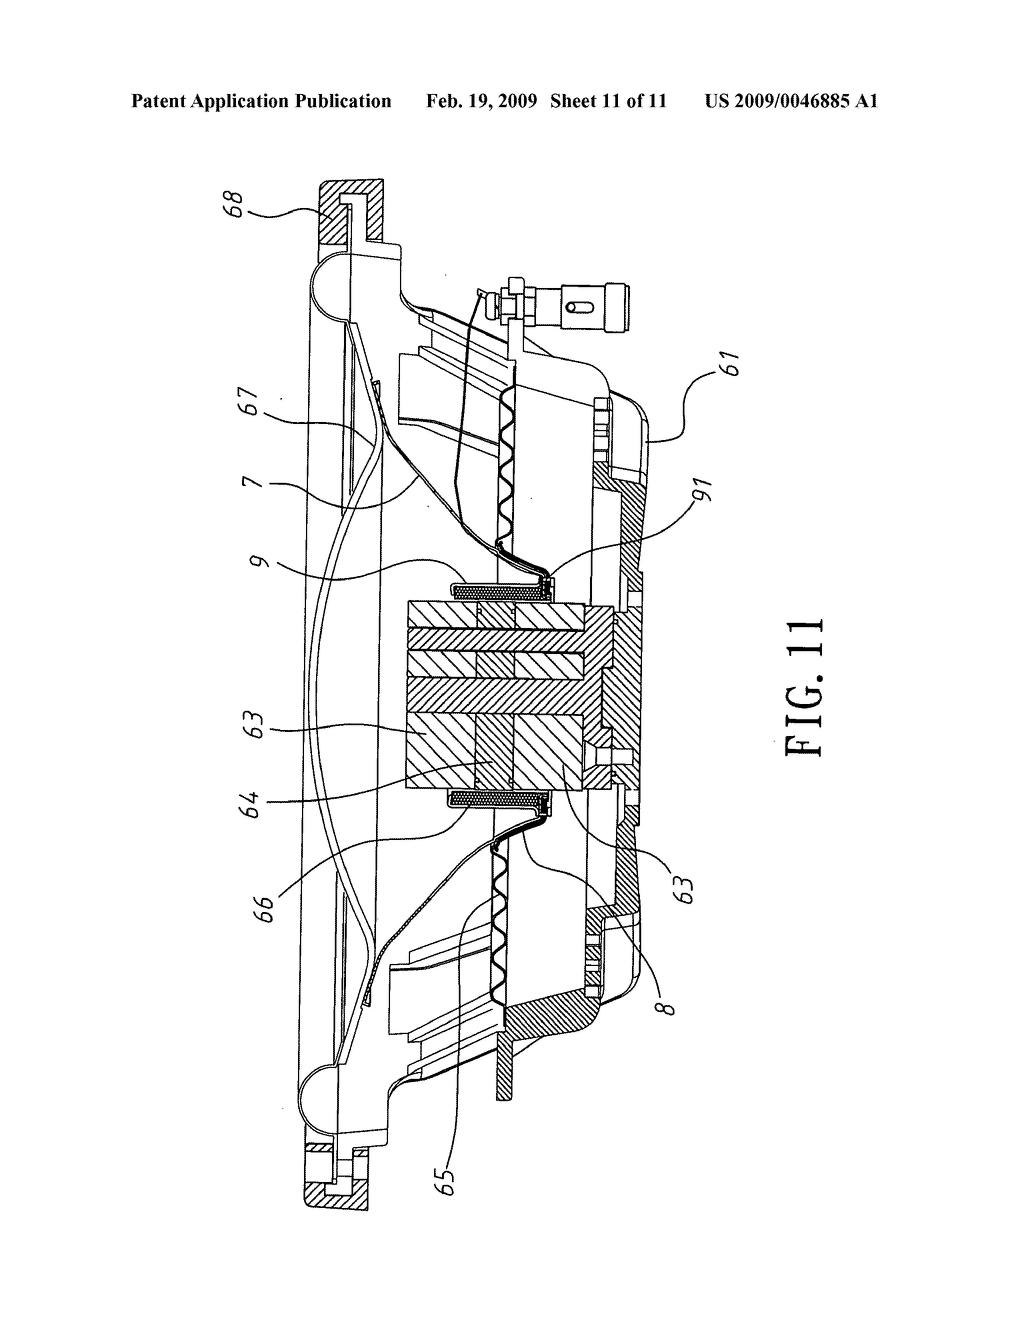 speaker damper mounting structure diagram, schematic, and image 12 Speaker Diagram Speaker Diagram #34 speaker diagram